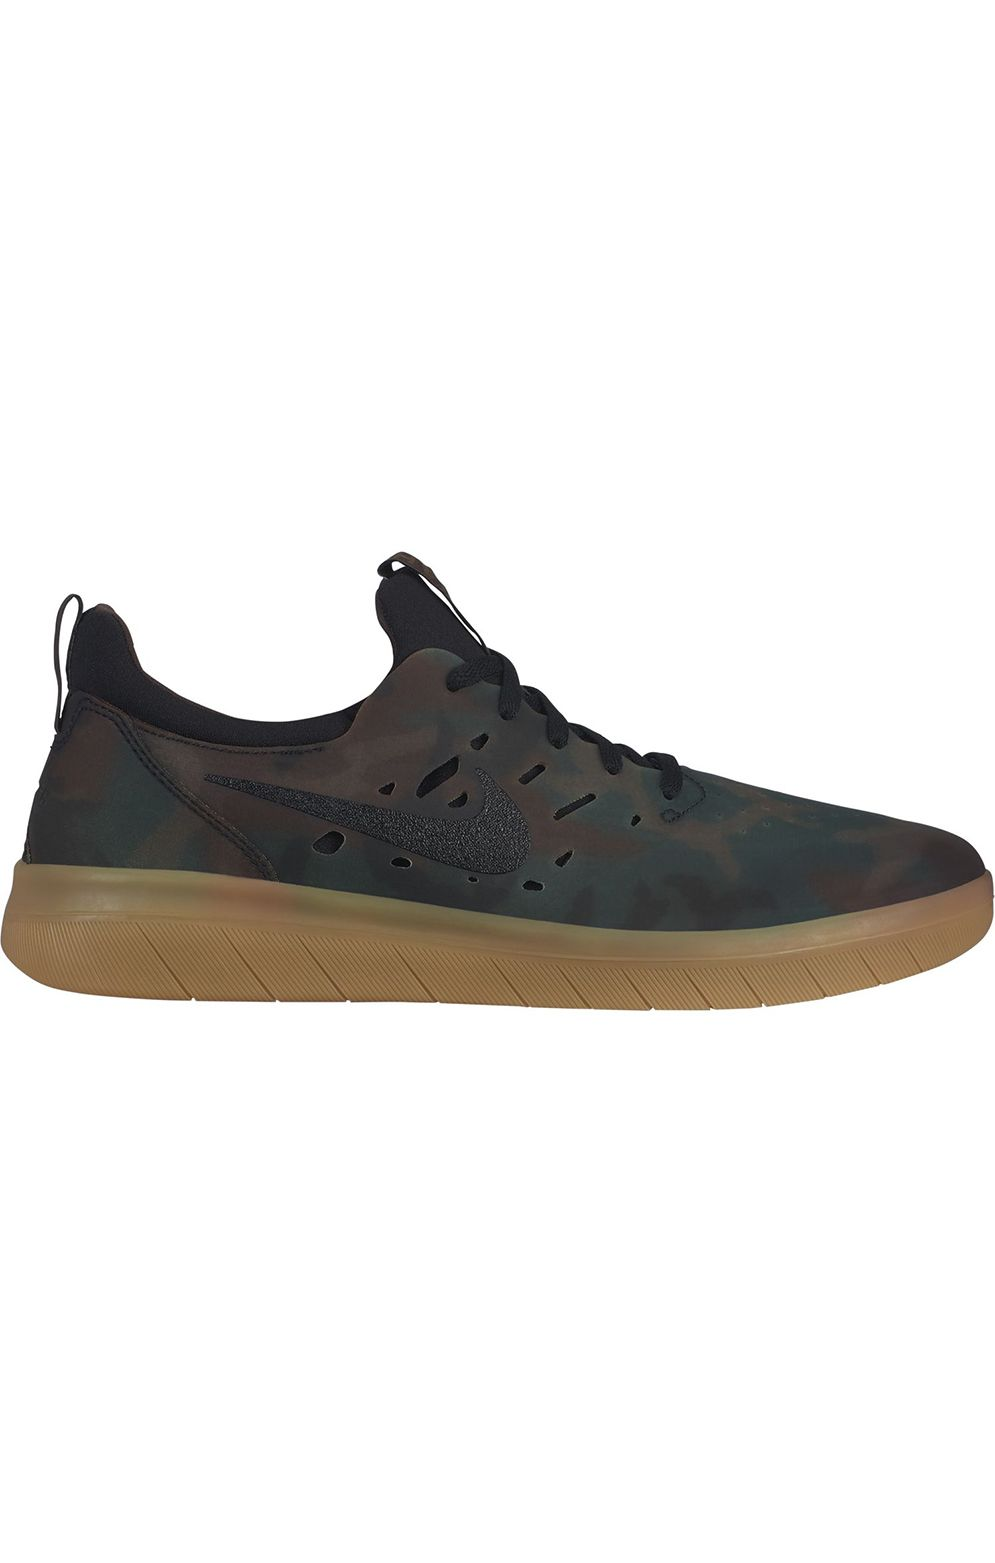 d1f5abd4965c7 Tenis Nike Sb NYJAH FREE PRM Multi-Color Black-Gum Lt Brown